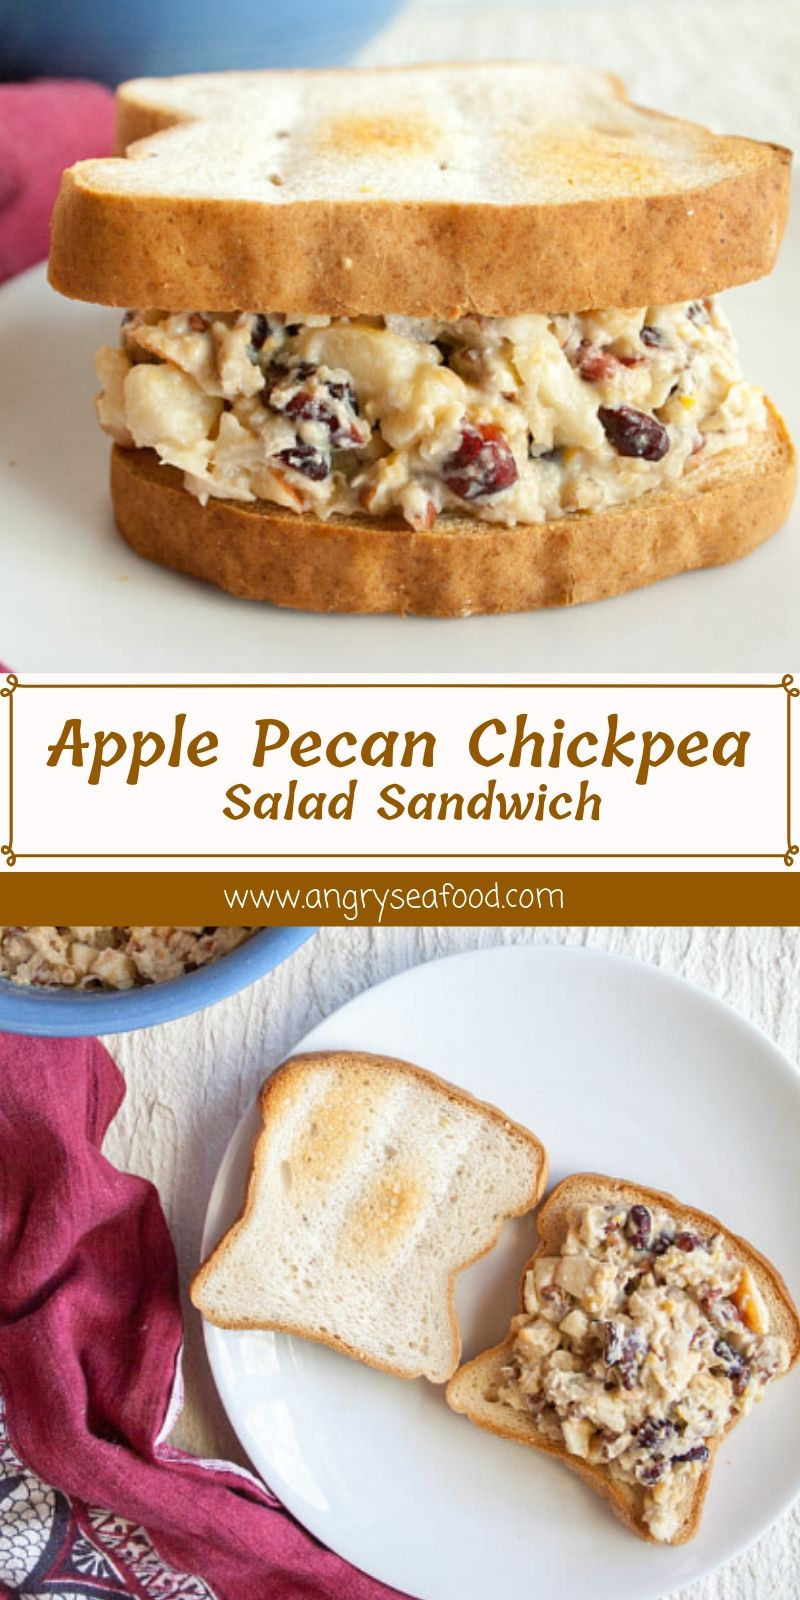 Apple Pecan Chickpea Salad Sandwich